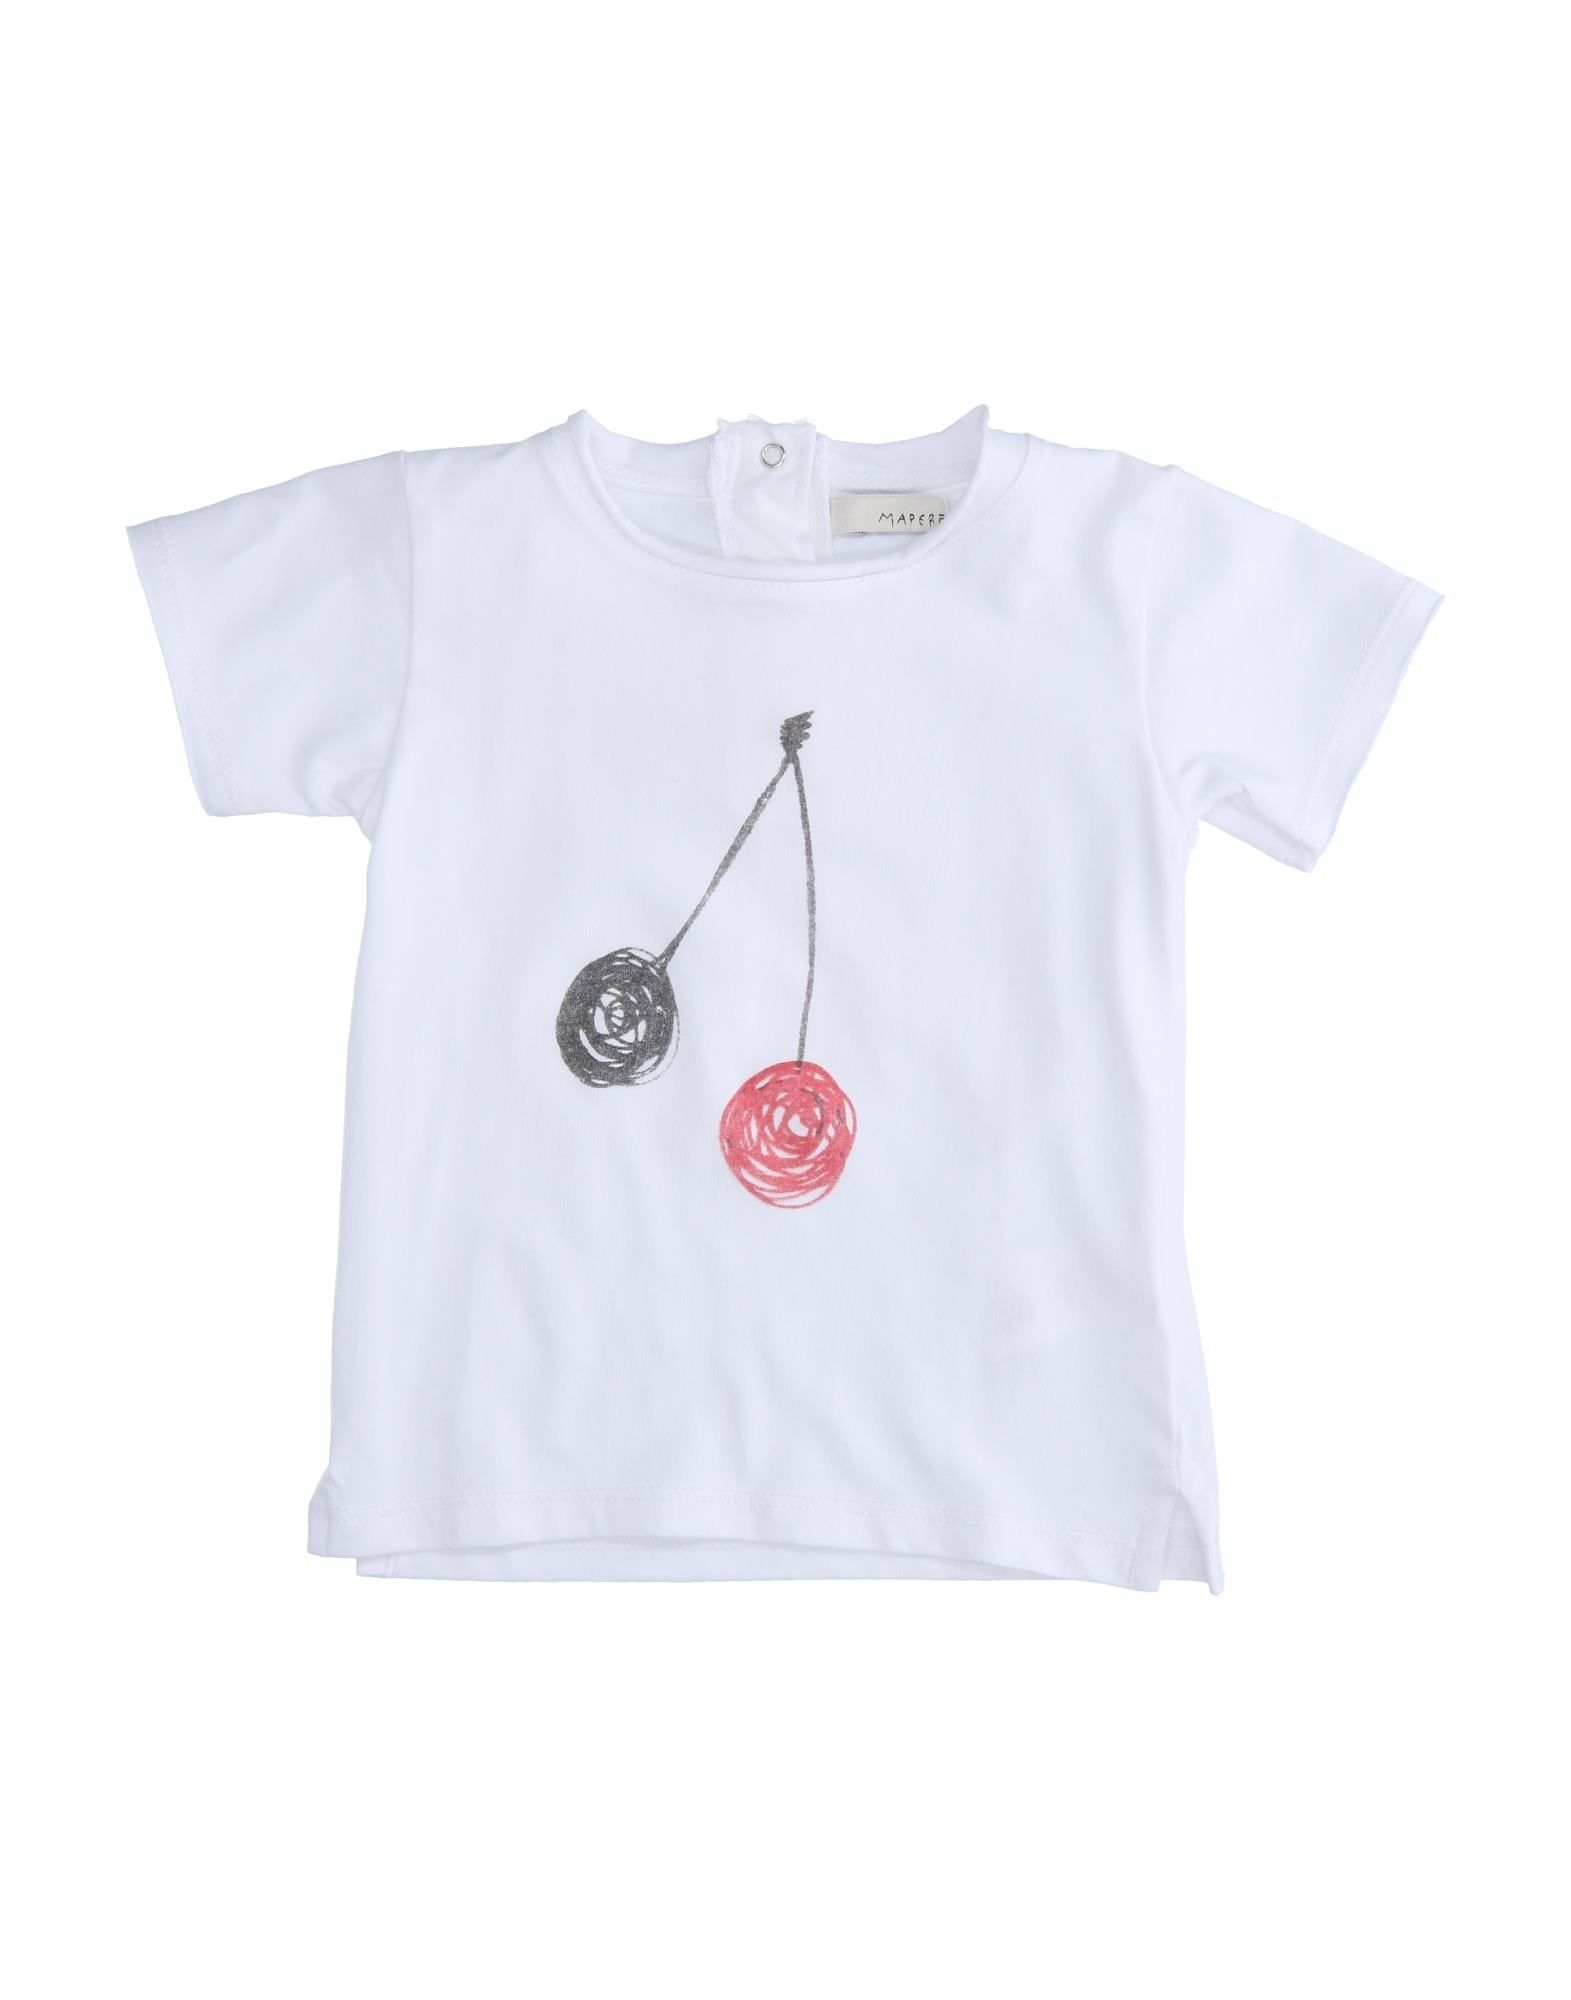 Mapero Kids' T-shirts In White